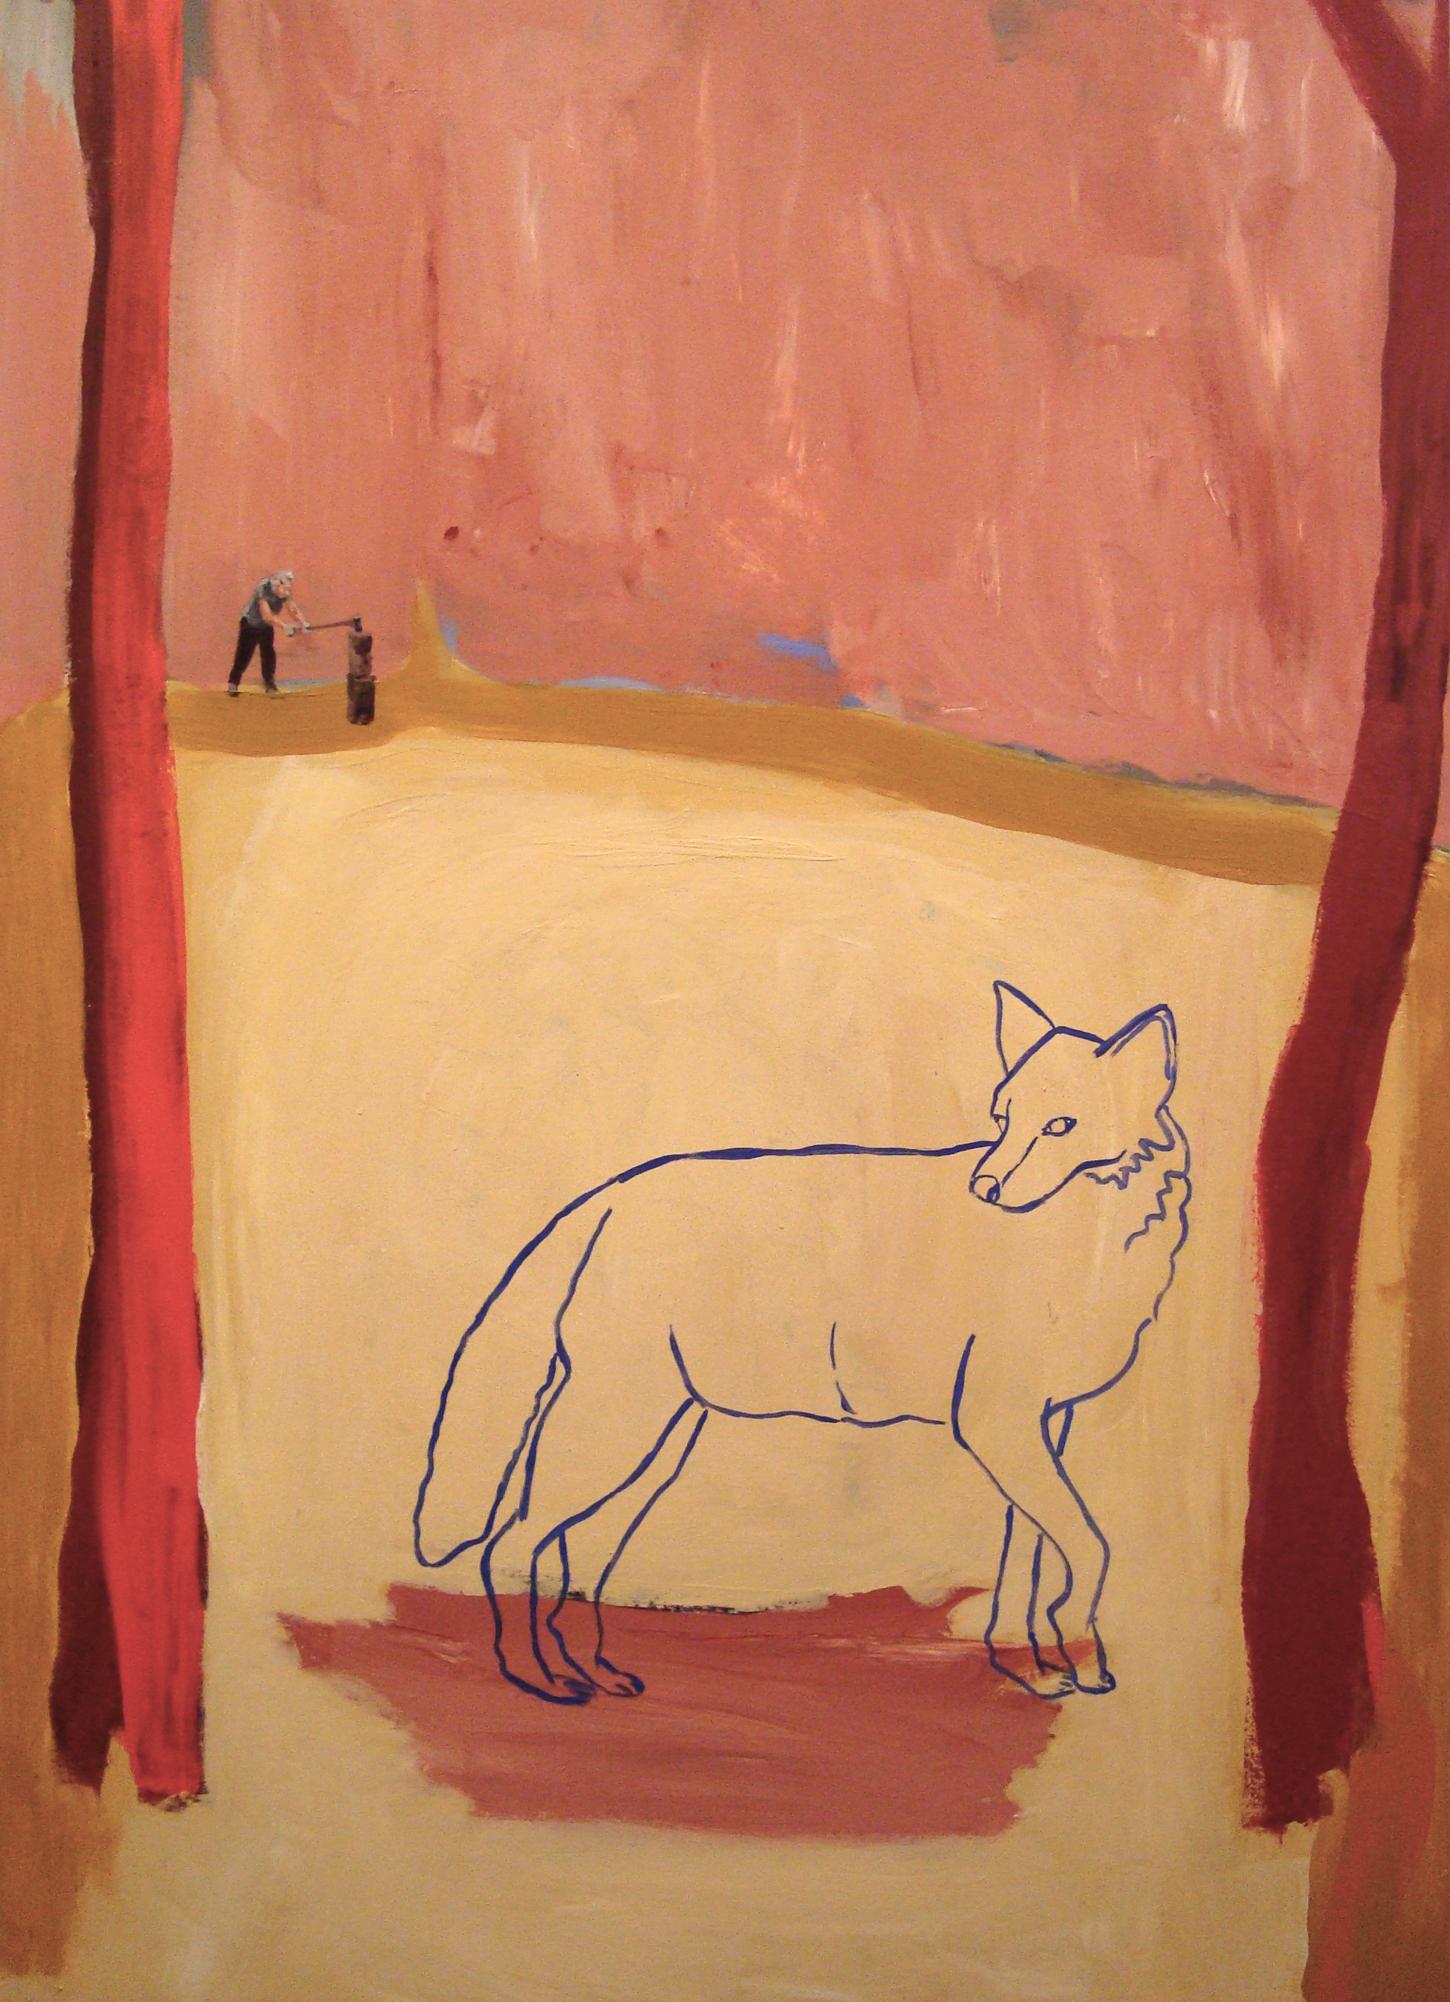 06. Imaginary Coyote